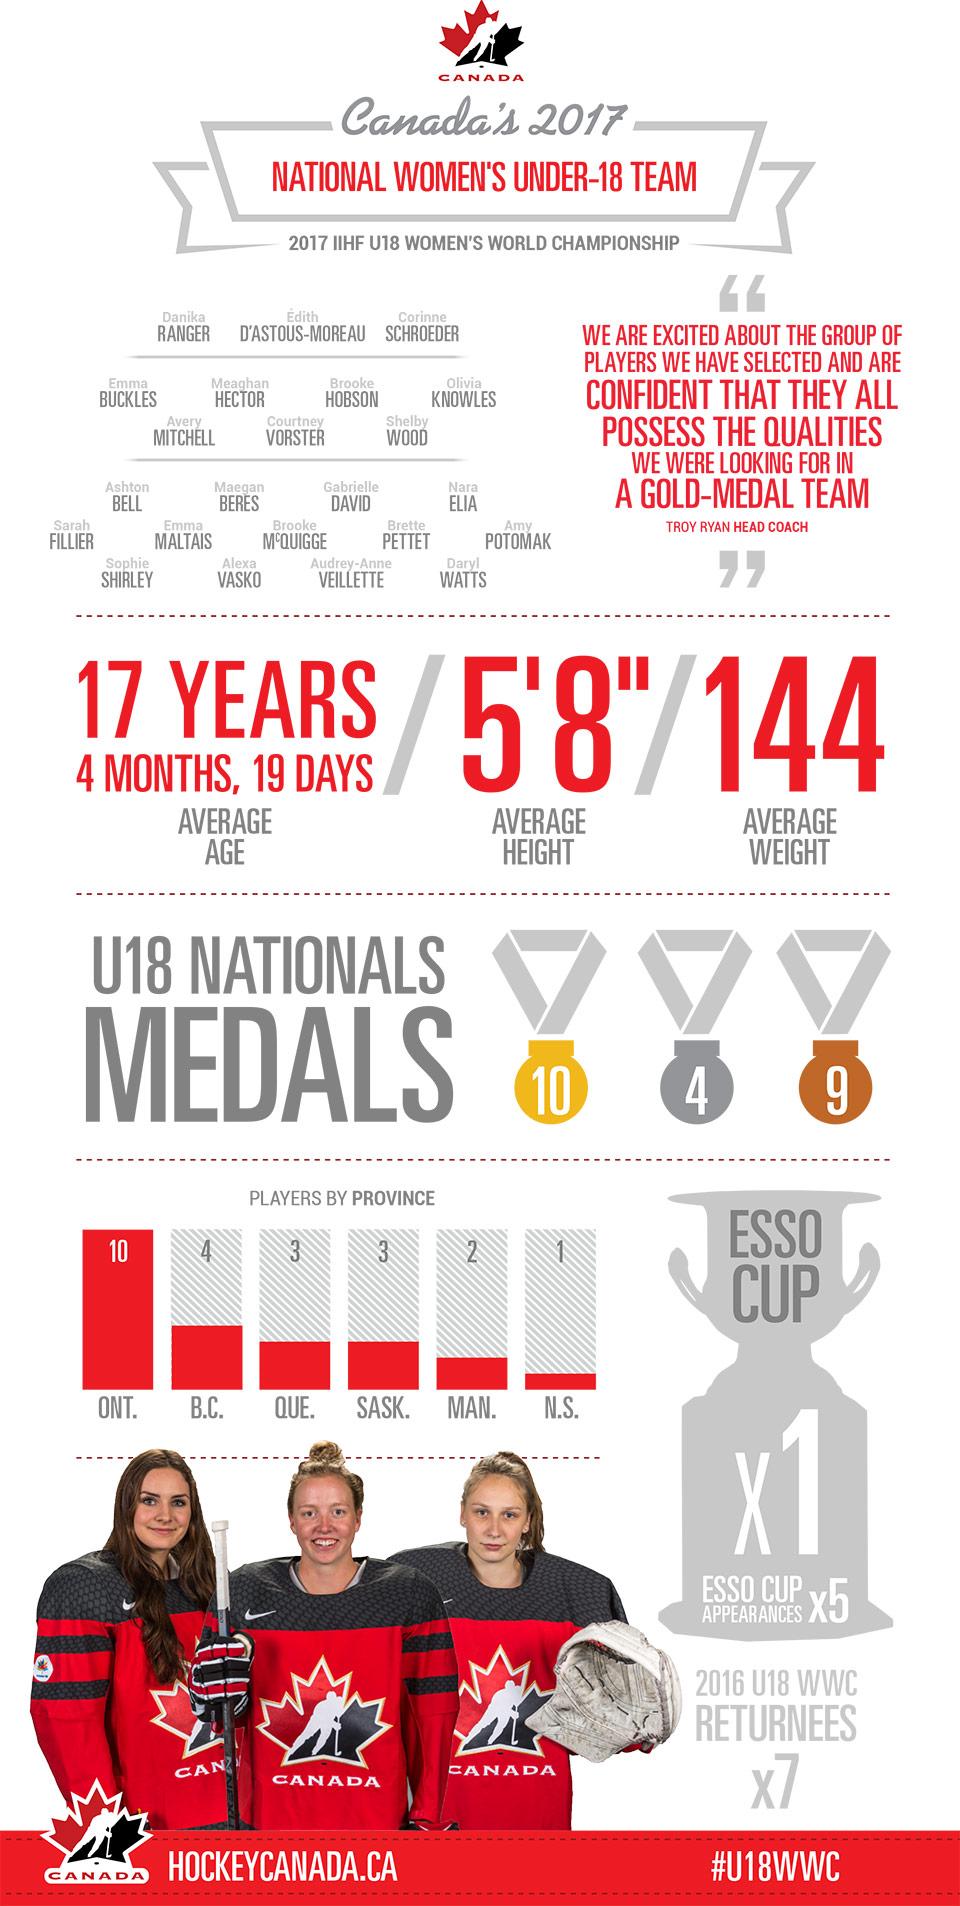 2017 IIHF U18 Women's World Championship - Team Canada Infographic